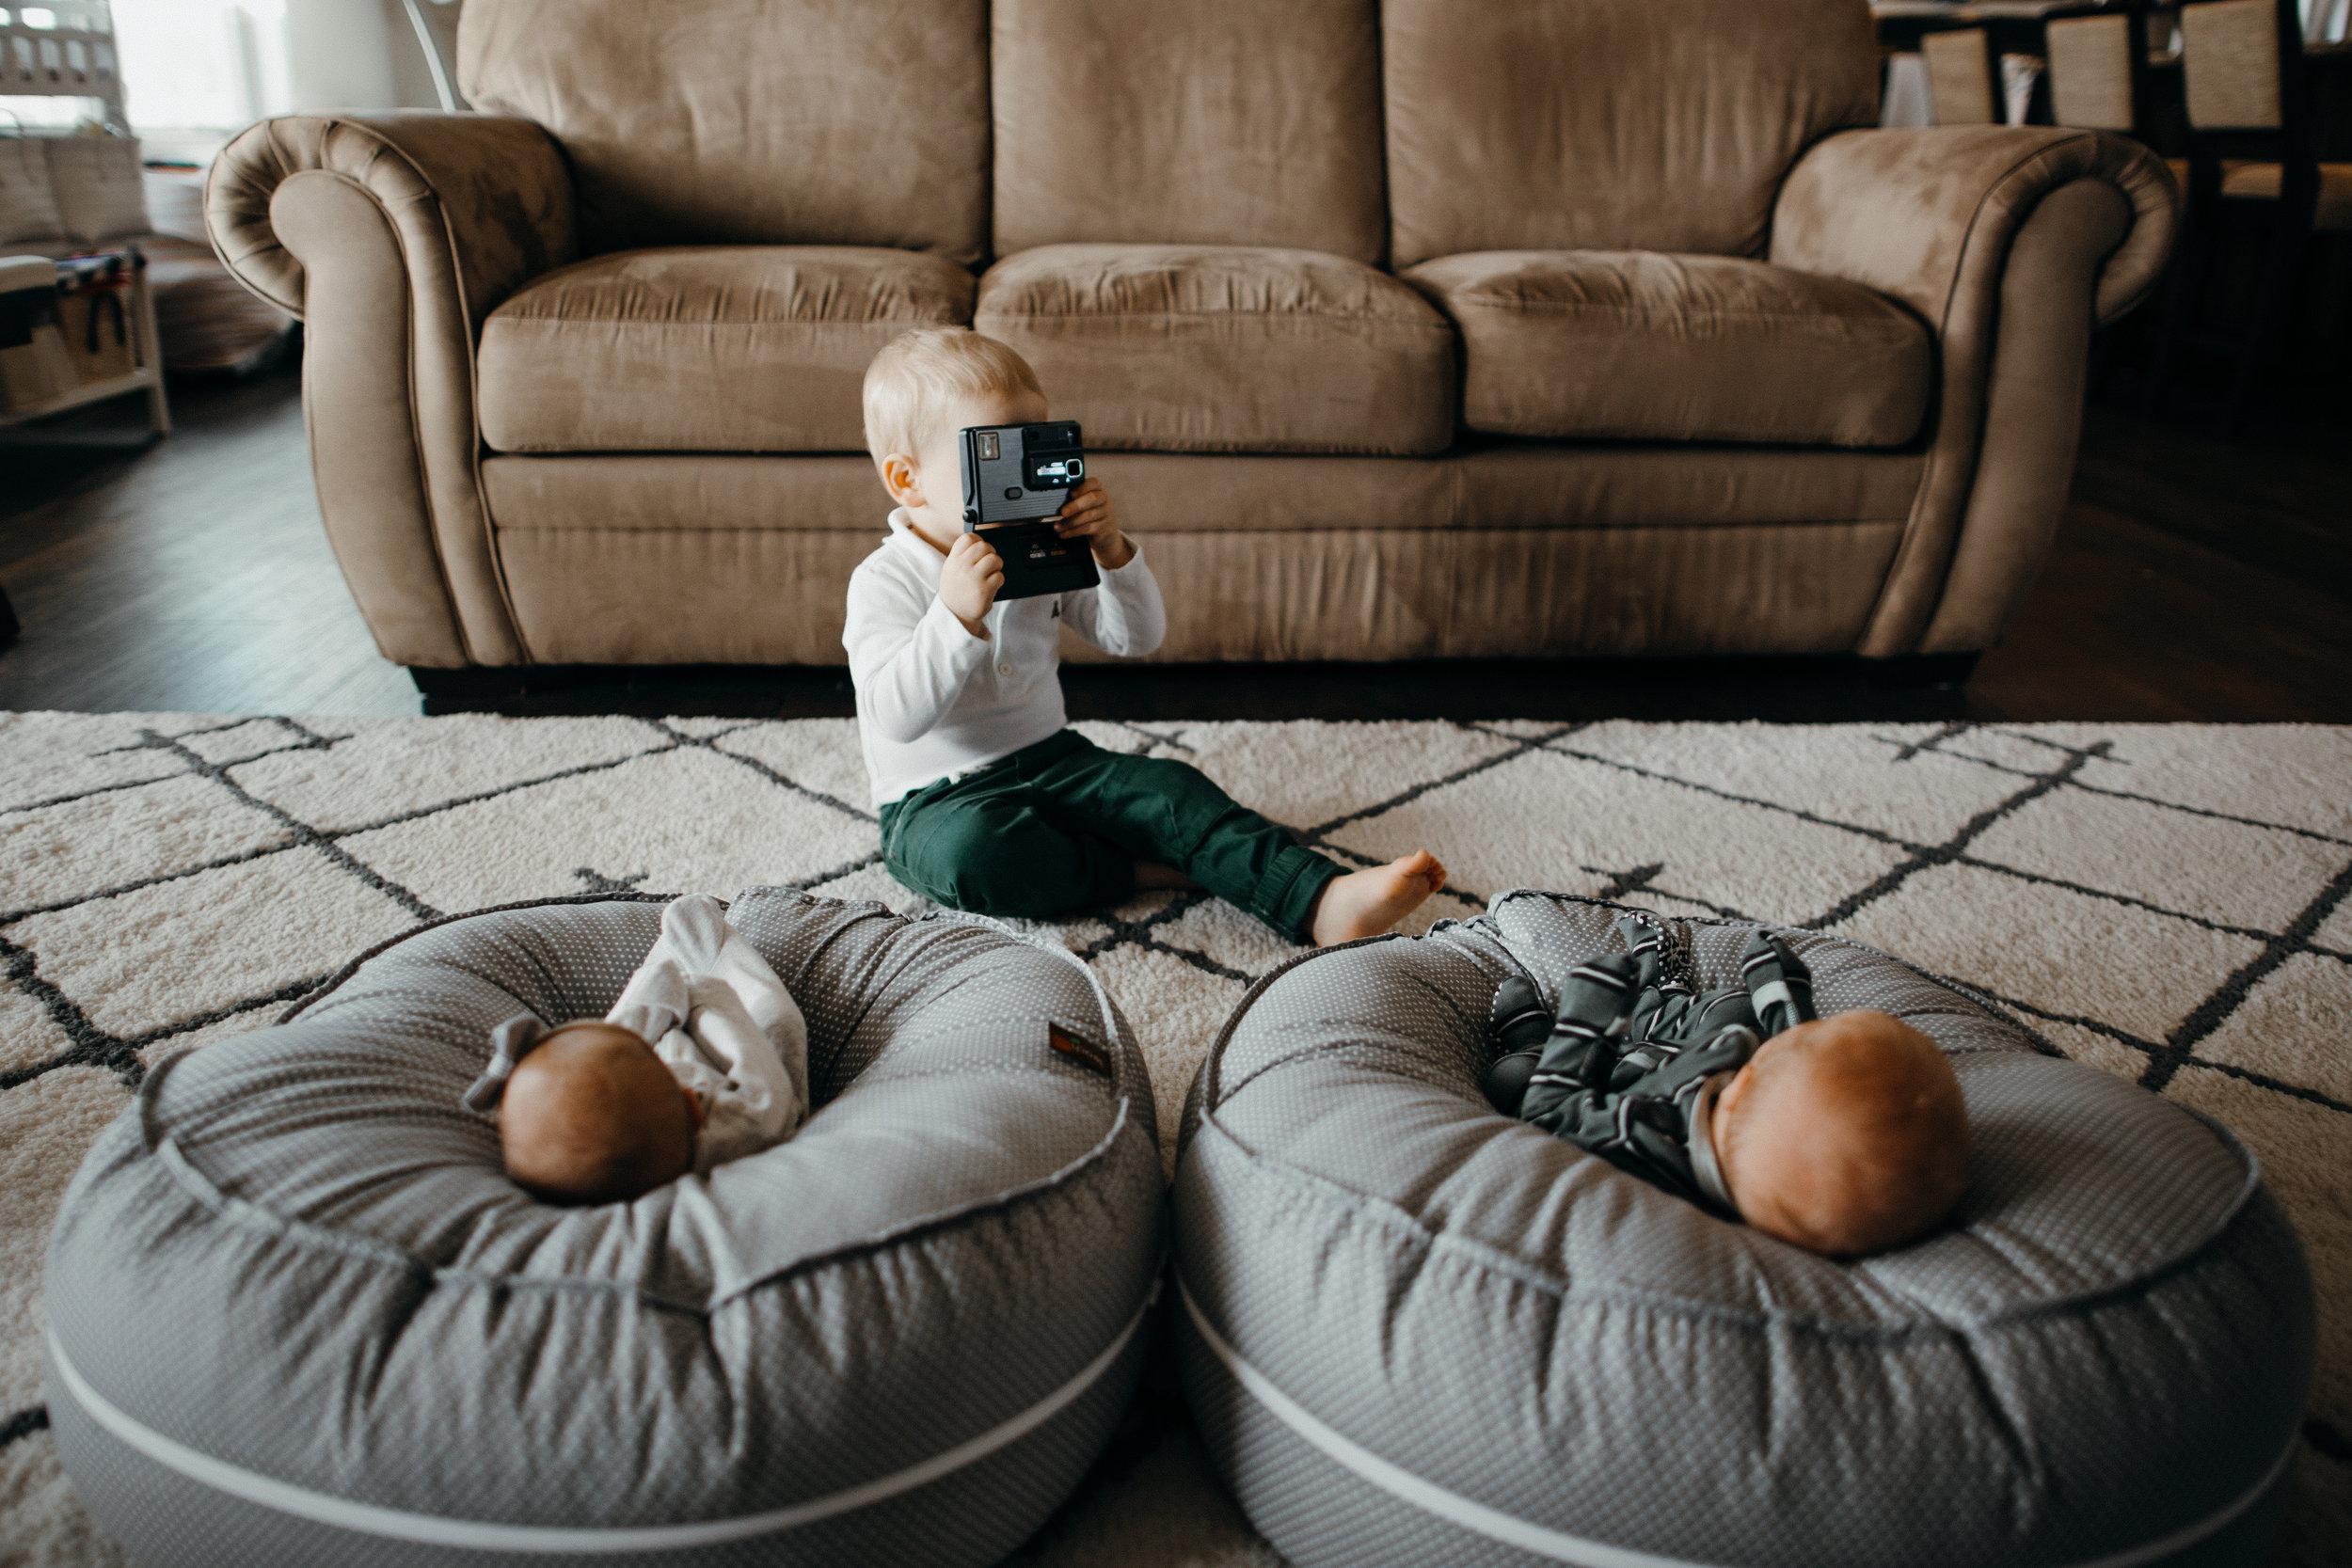 jamieleighmiller_inhome_newborn_photographer_omahanebraska-2.jpg